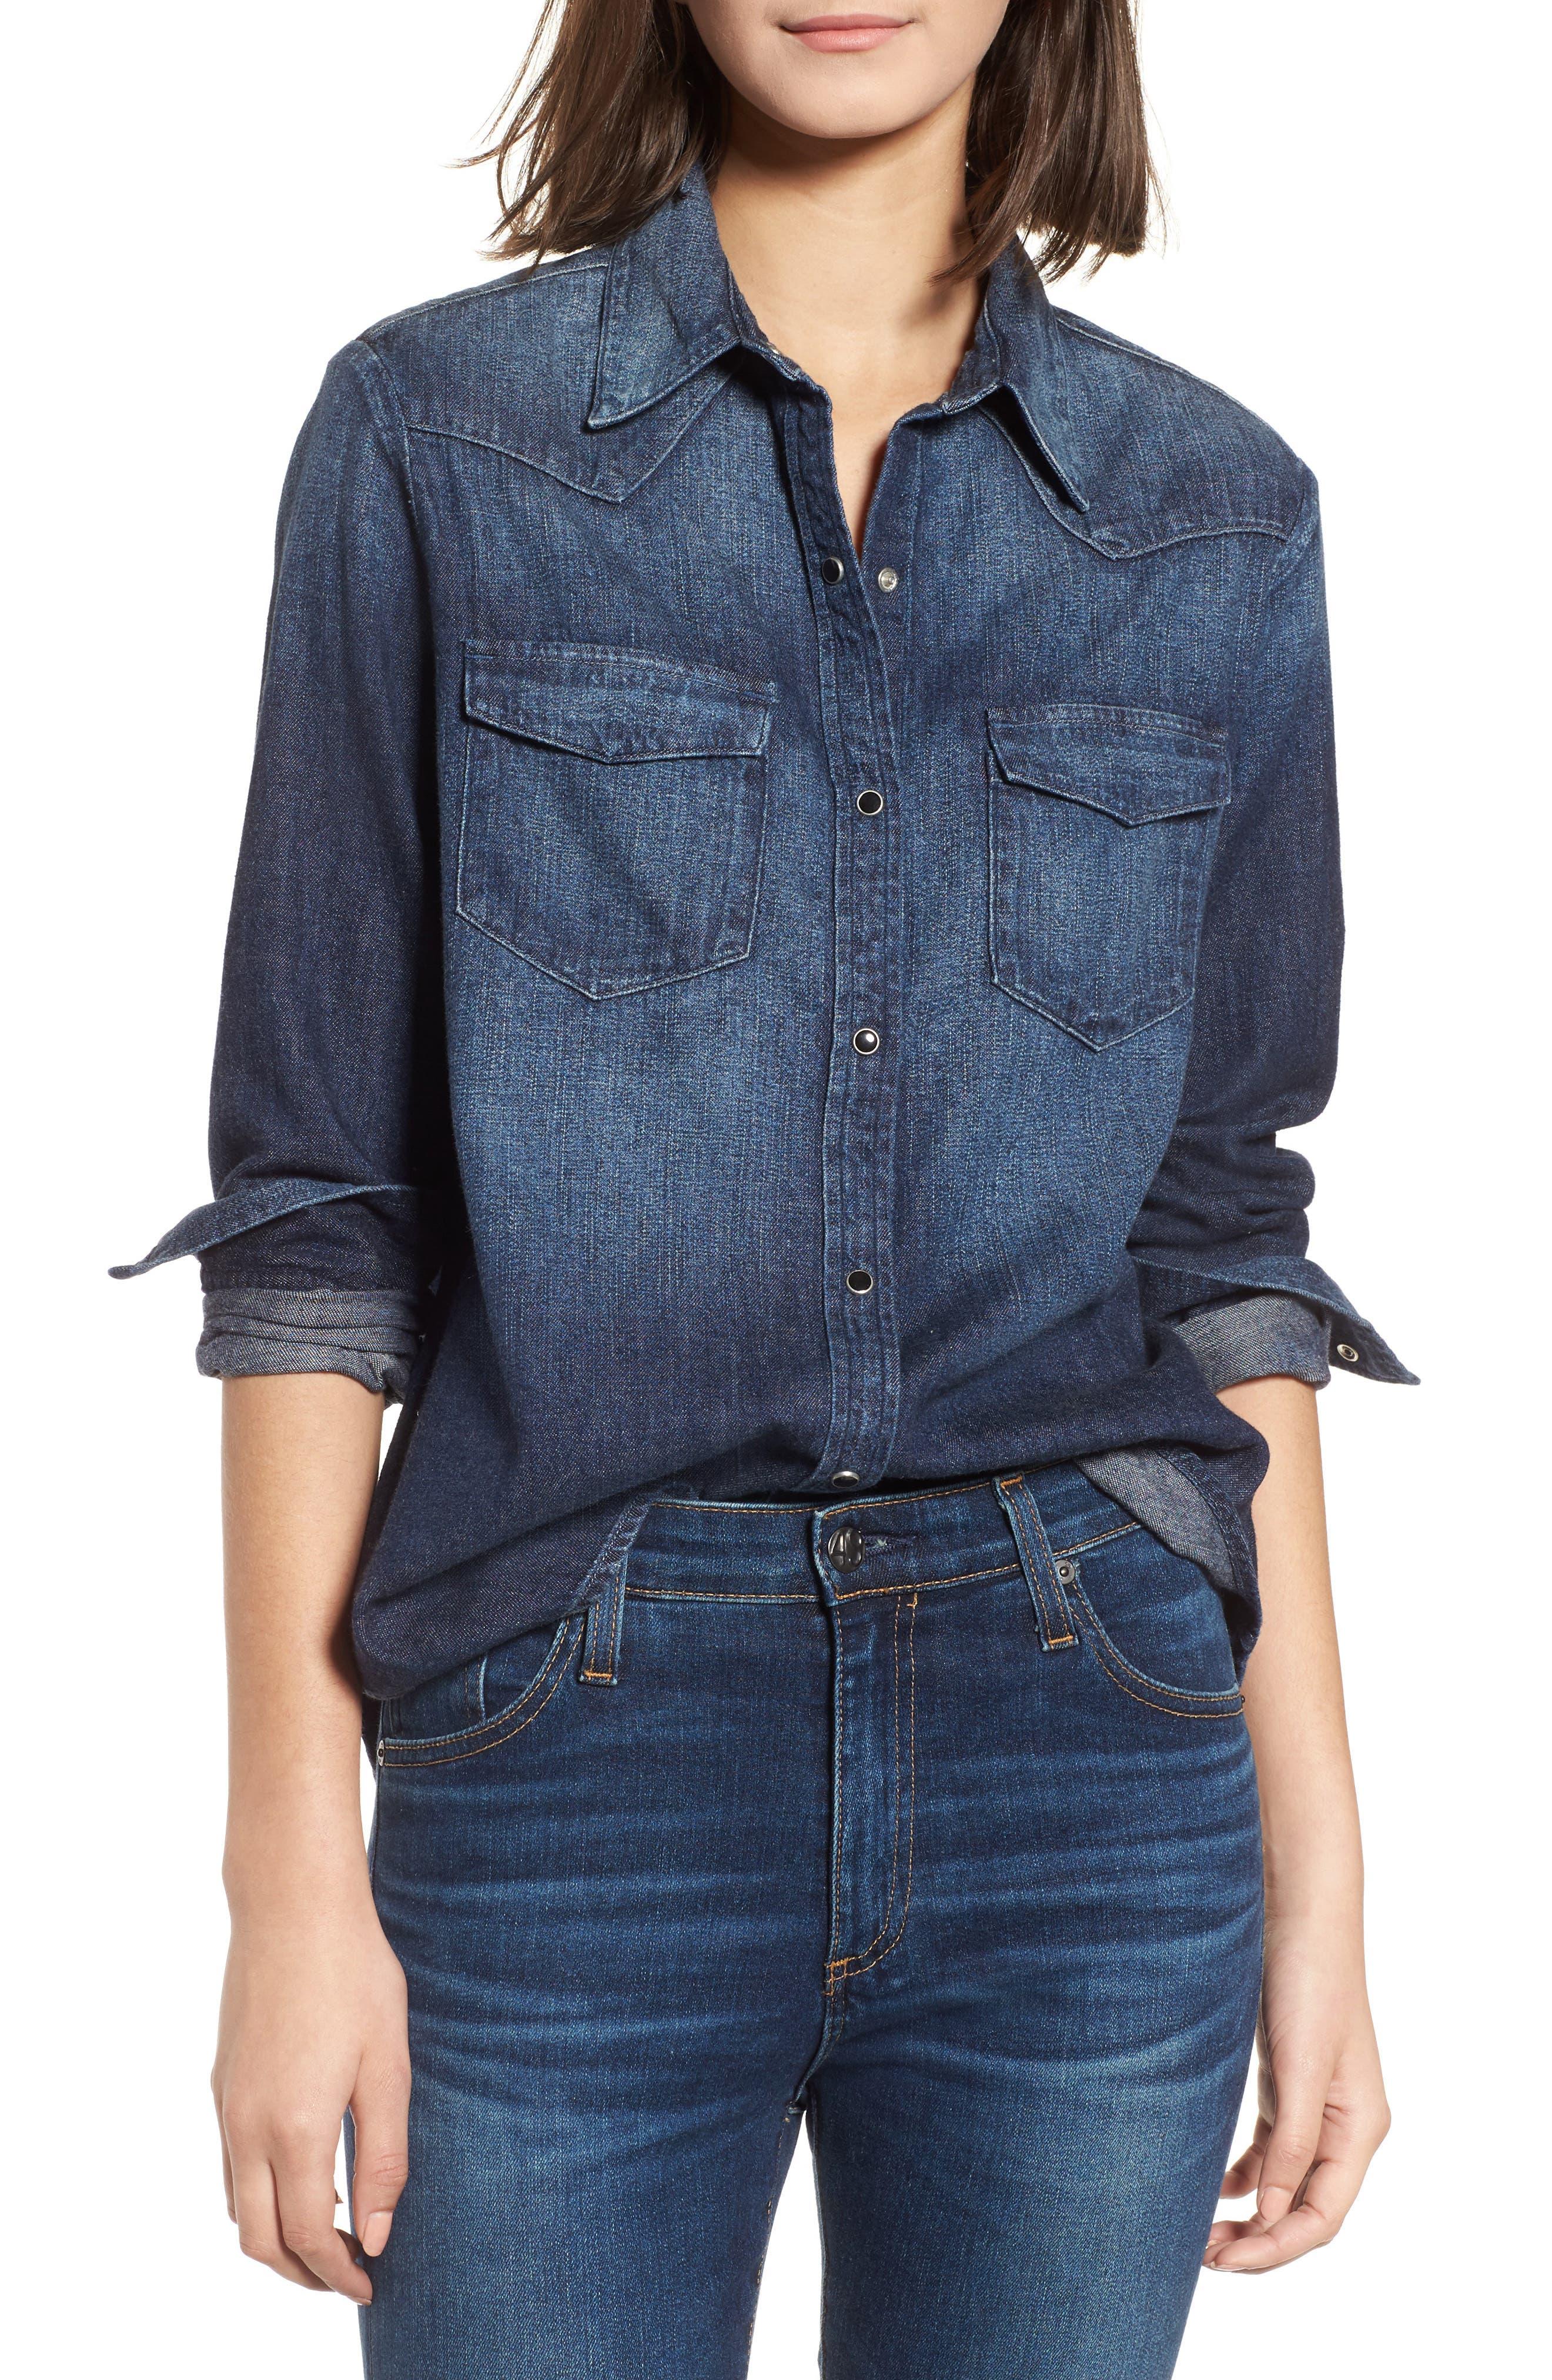 Deanna Denim Shirt,                         Main,                         color, TIMELESS